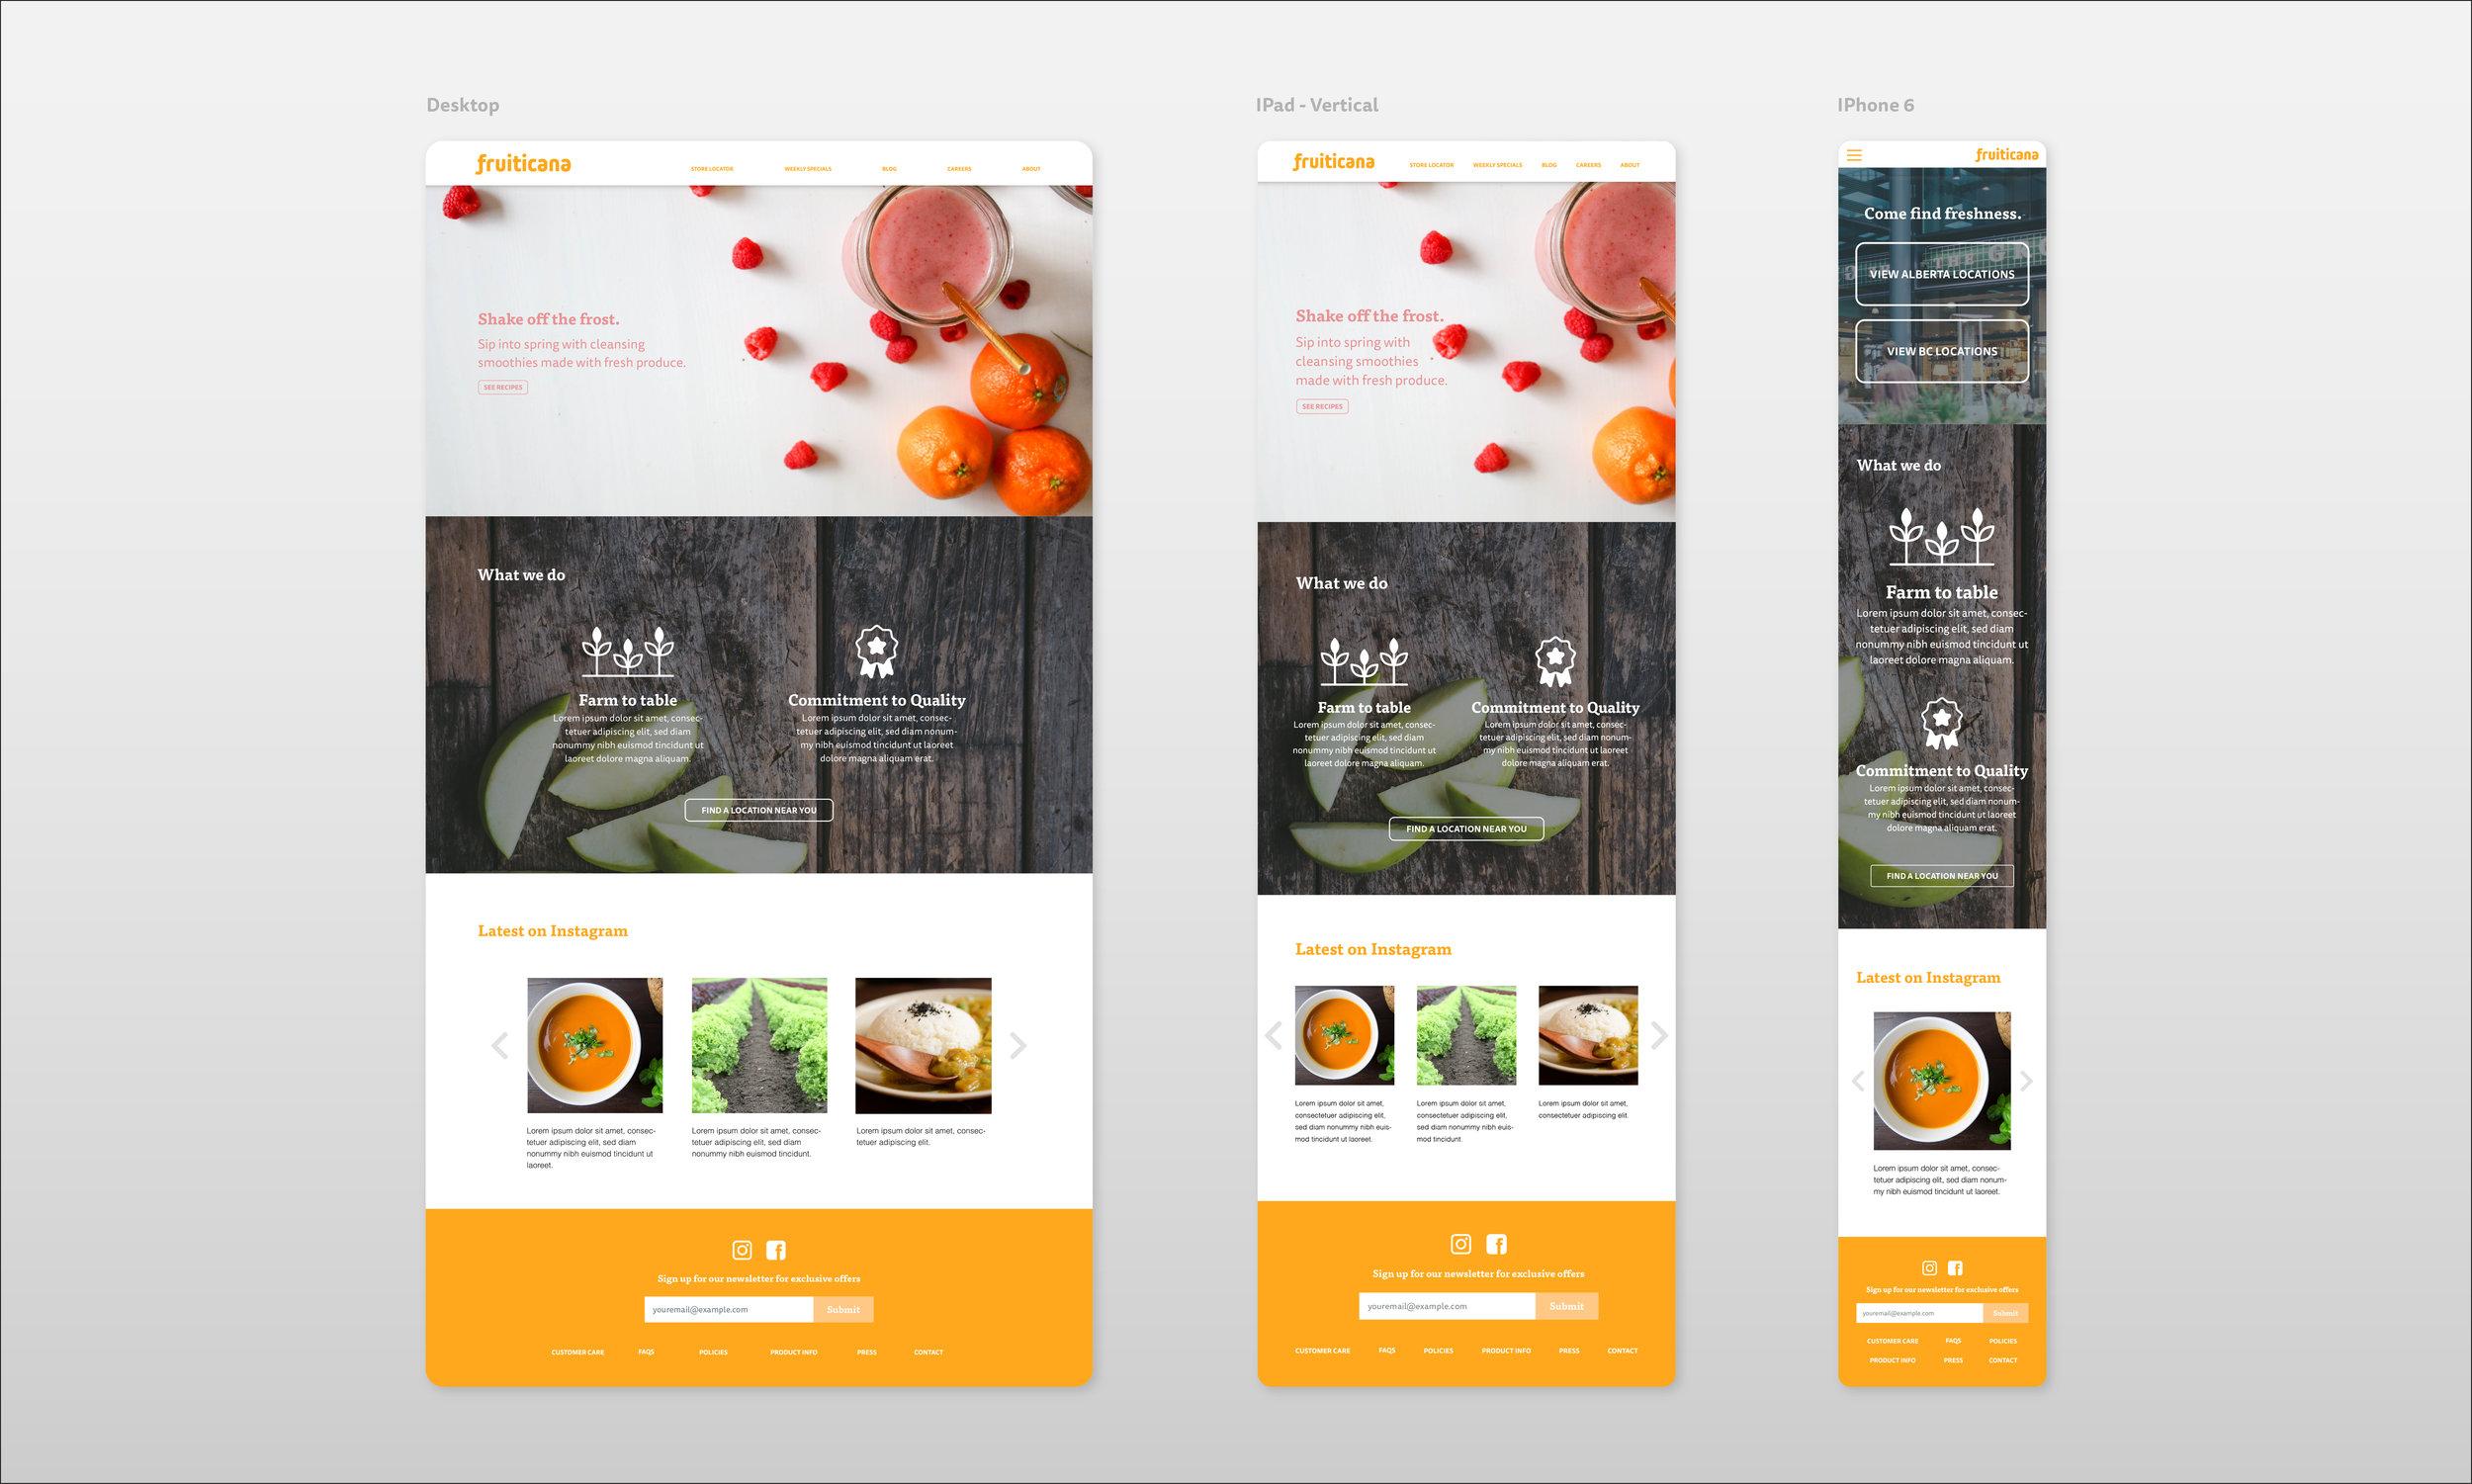 webpages-mockup-optimized-150.jpg